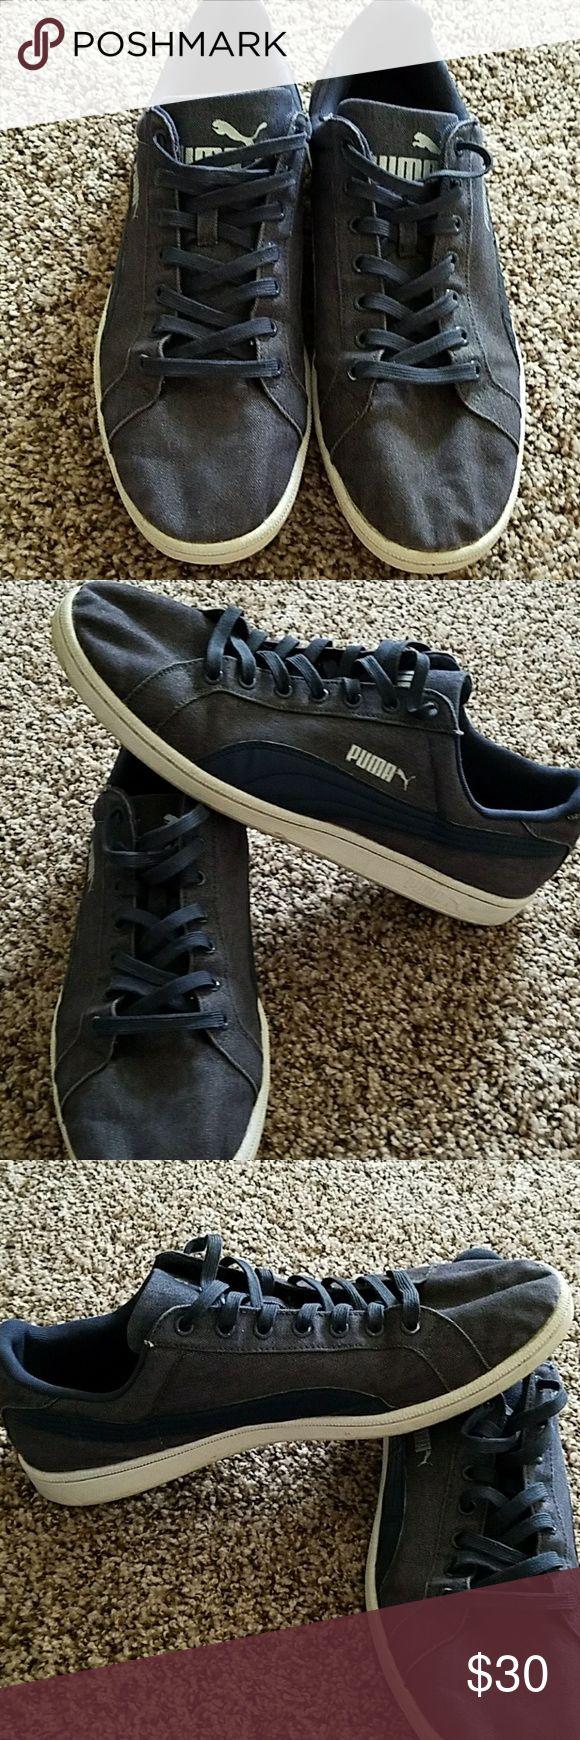 Men's Blue Puma's Blue pumas in excellent condition Puma Shoes Sneakers